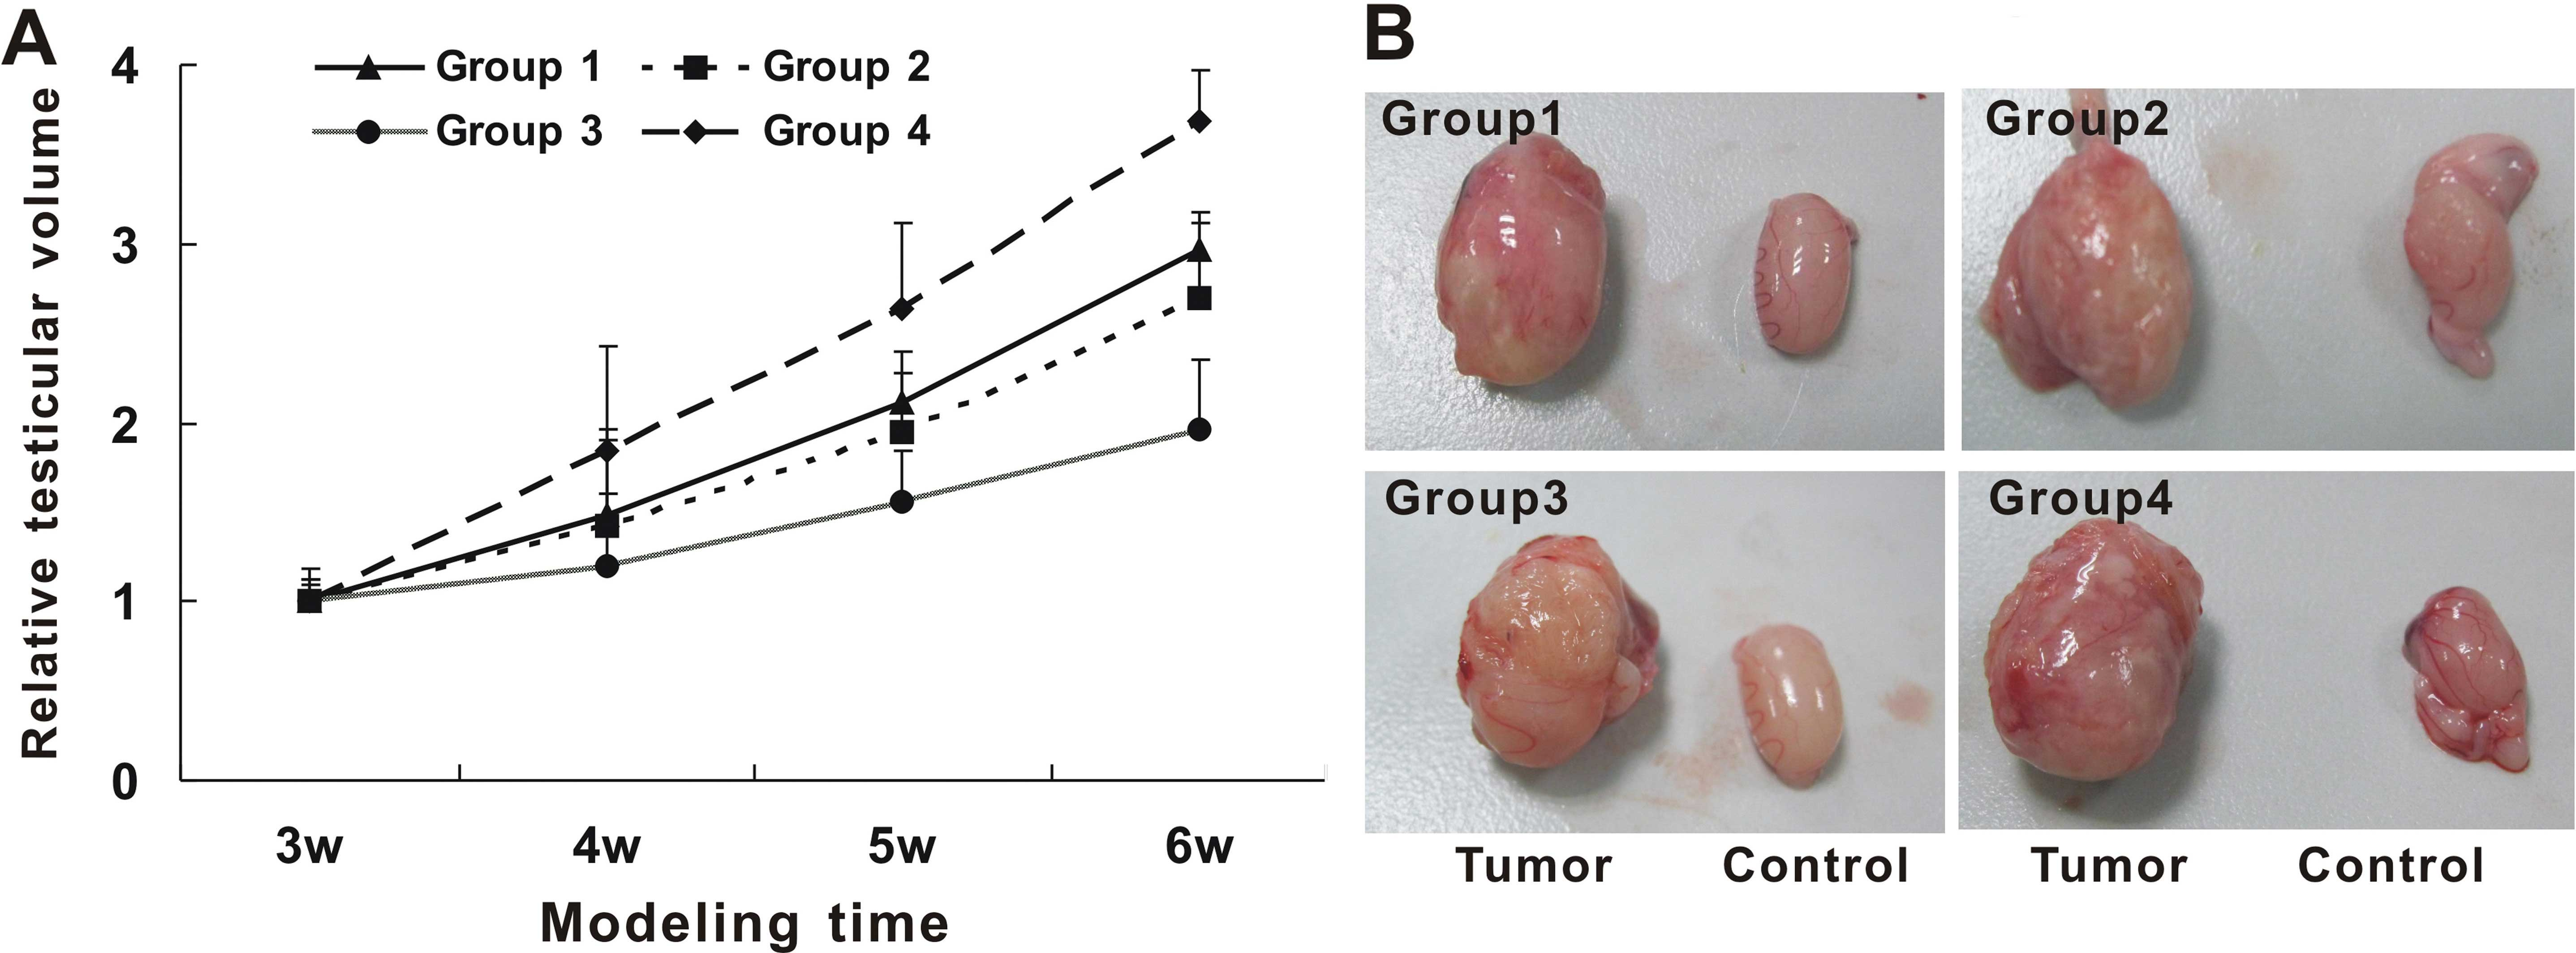 cancer metastatico no pulmao tem cura virus papiloma humano genotipo 45